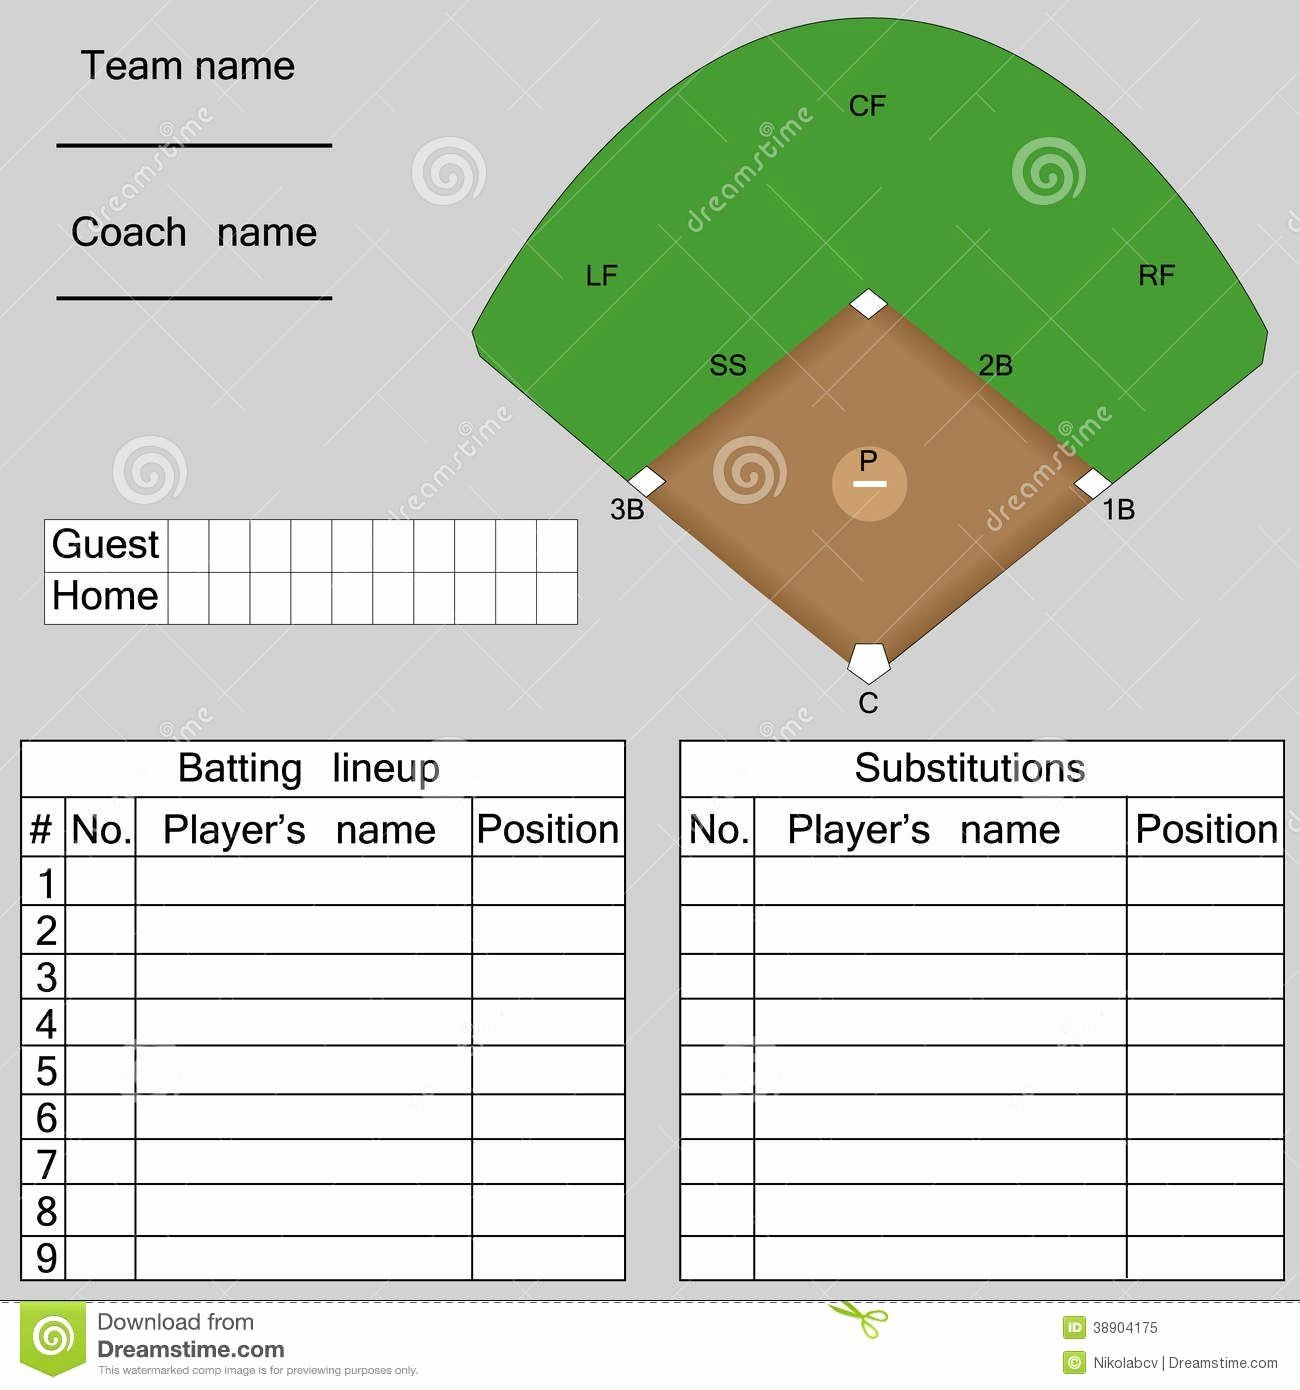 Baseball uniform order form template luxury image result